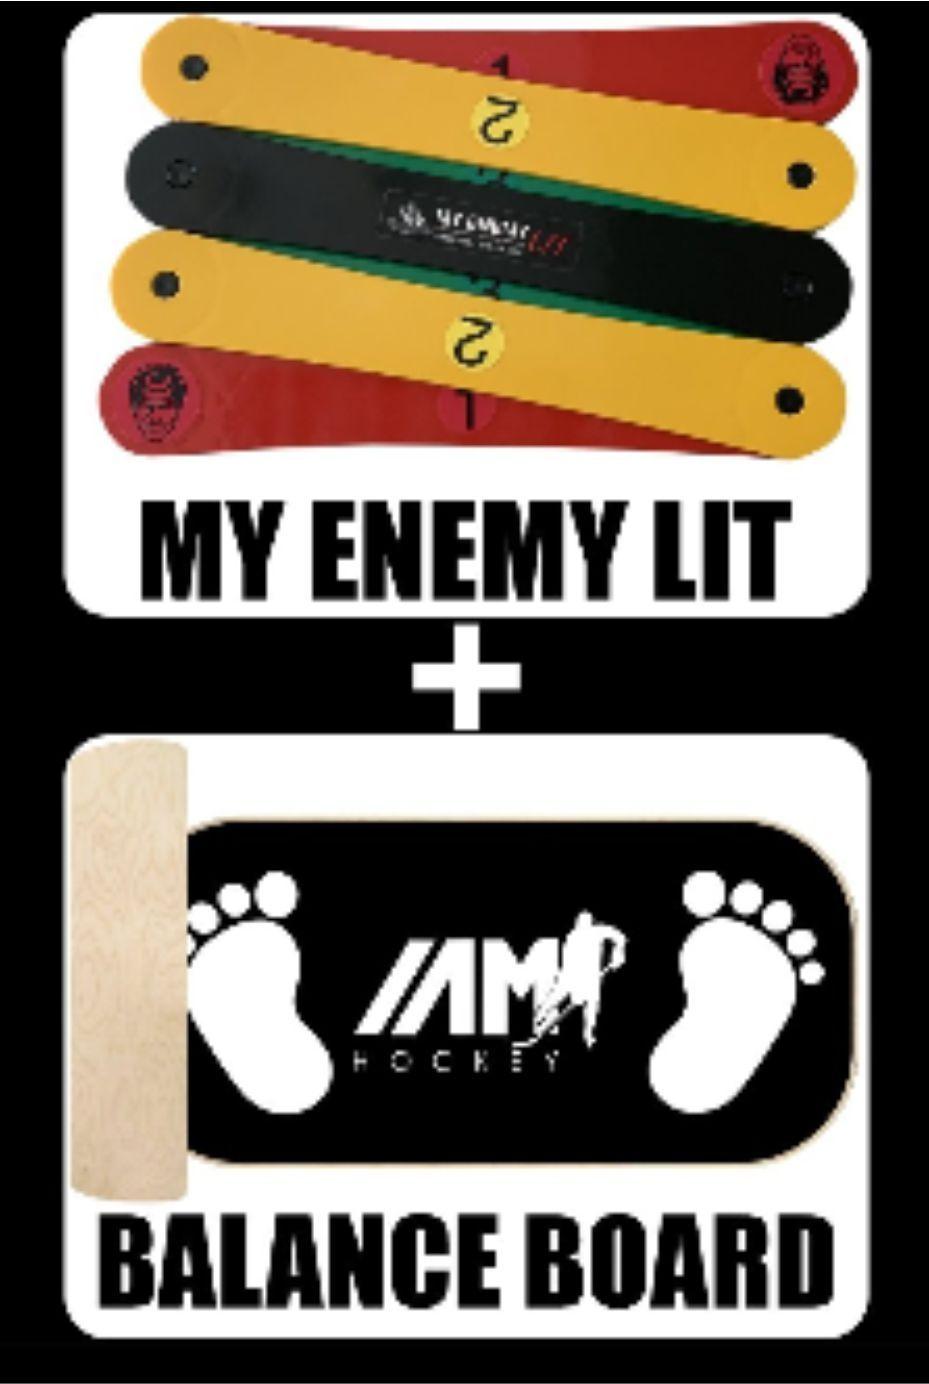 MY ENEMY LIT + BALANCE BOARD